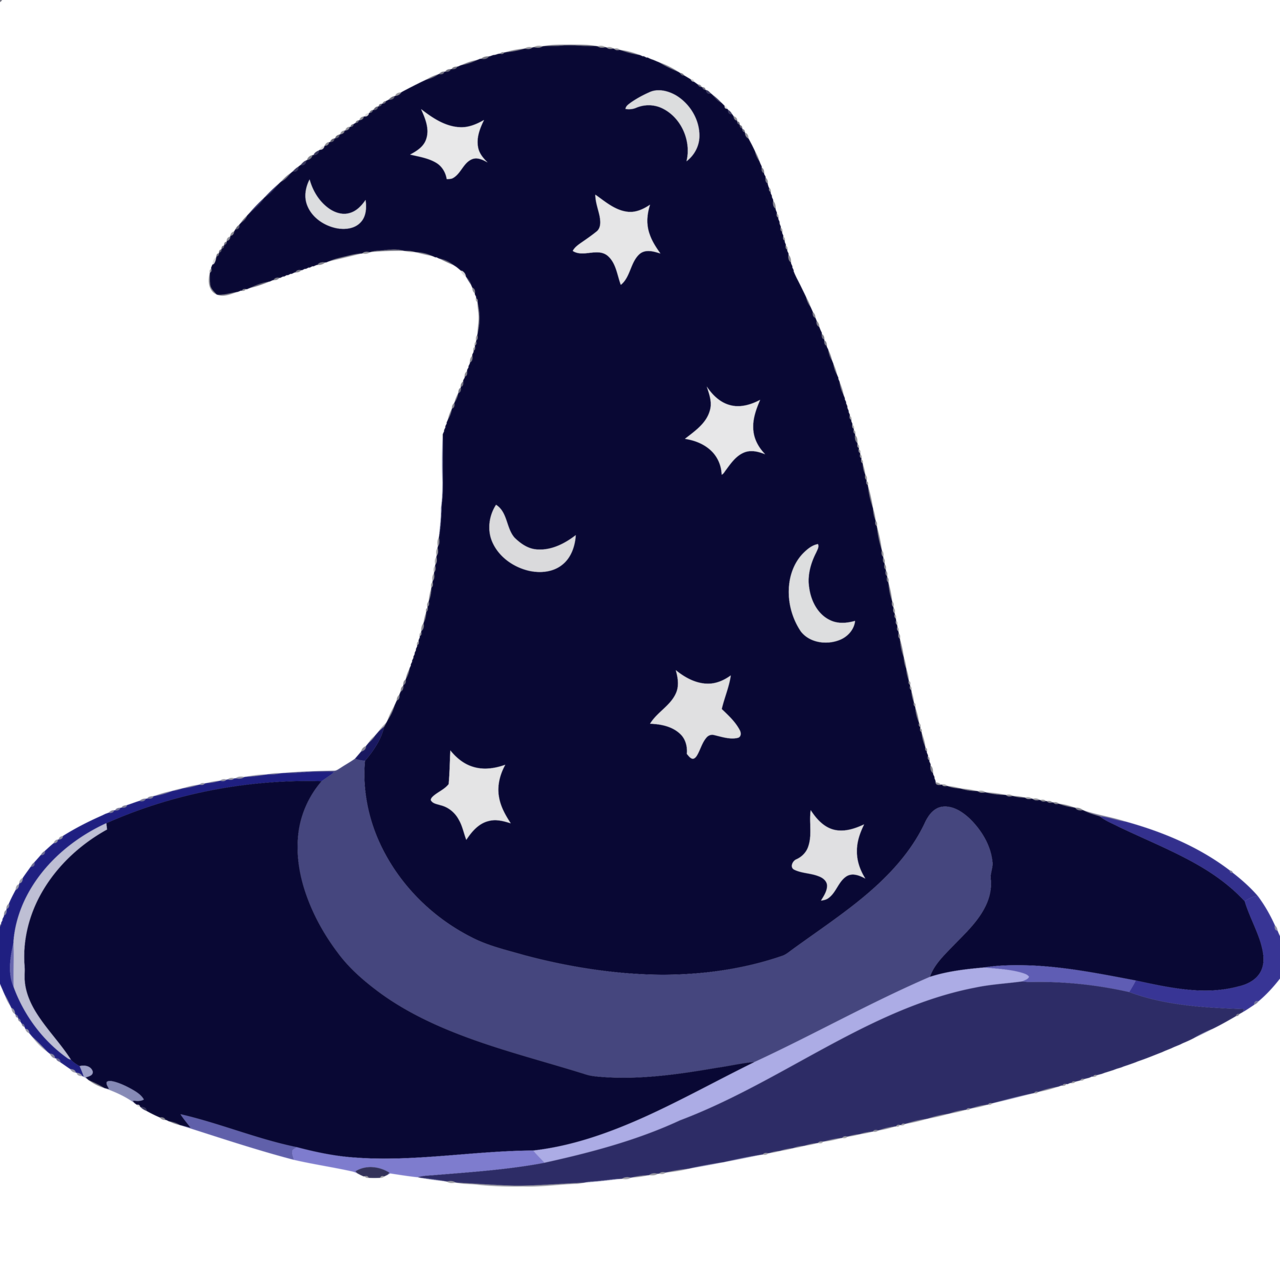 Fairy Wand Png - Zauberhut PNG